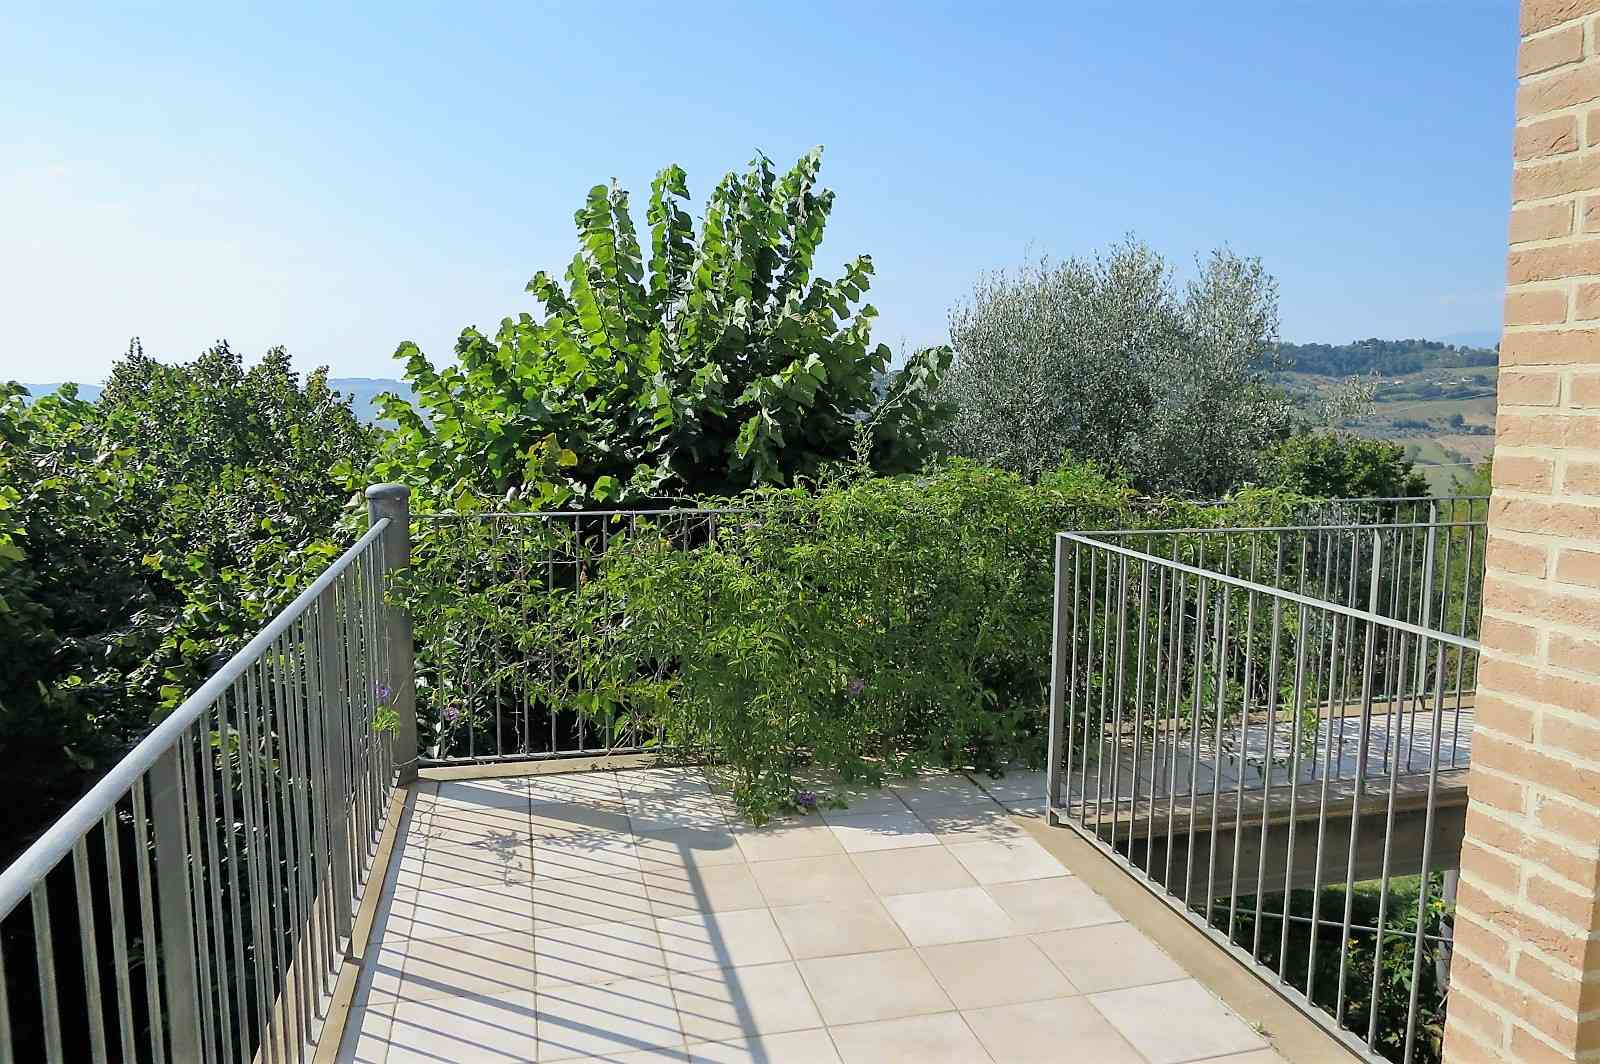 Villa Villa in vendita Atri (TE), Villa Paola - Atri - EUR 473.281 180